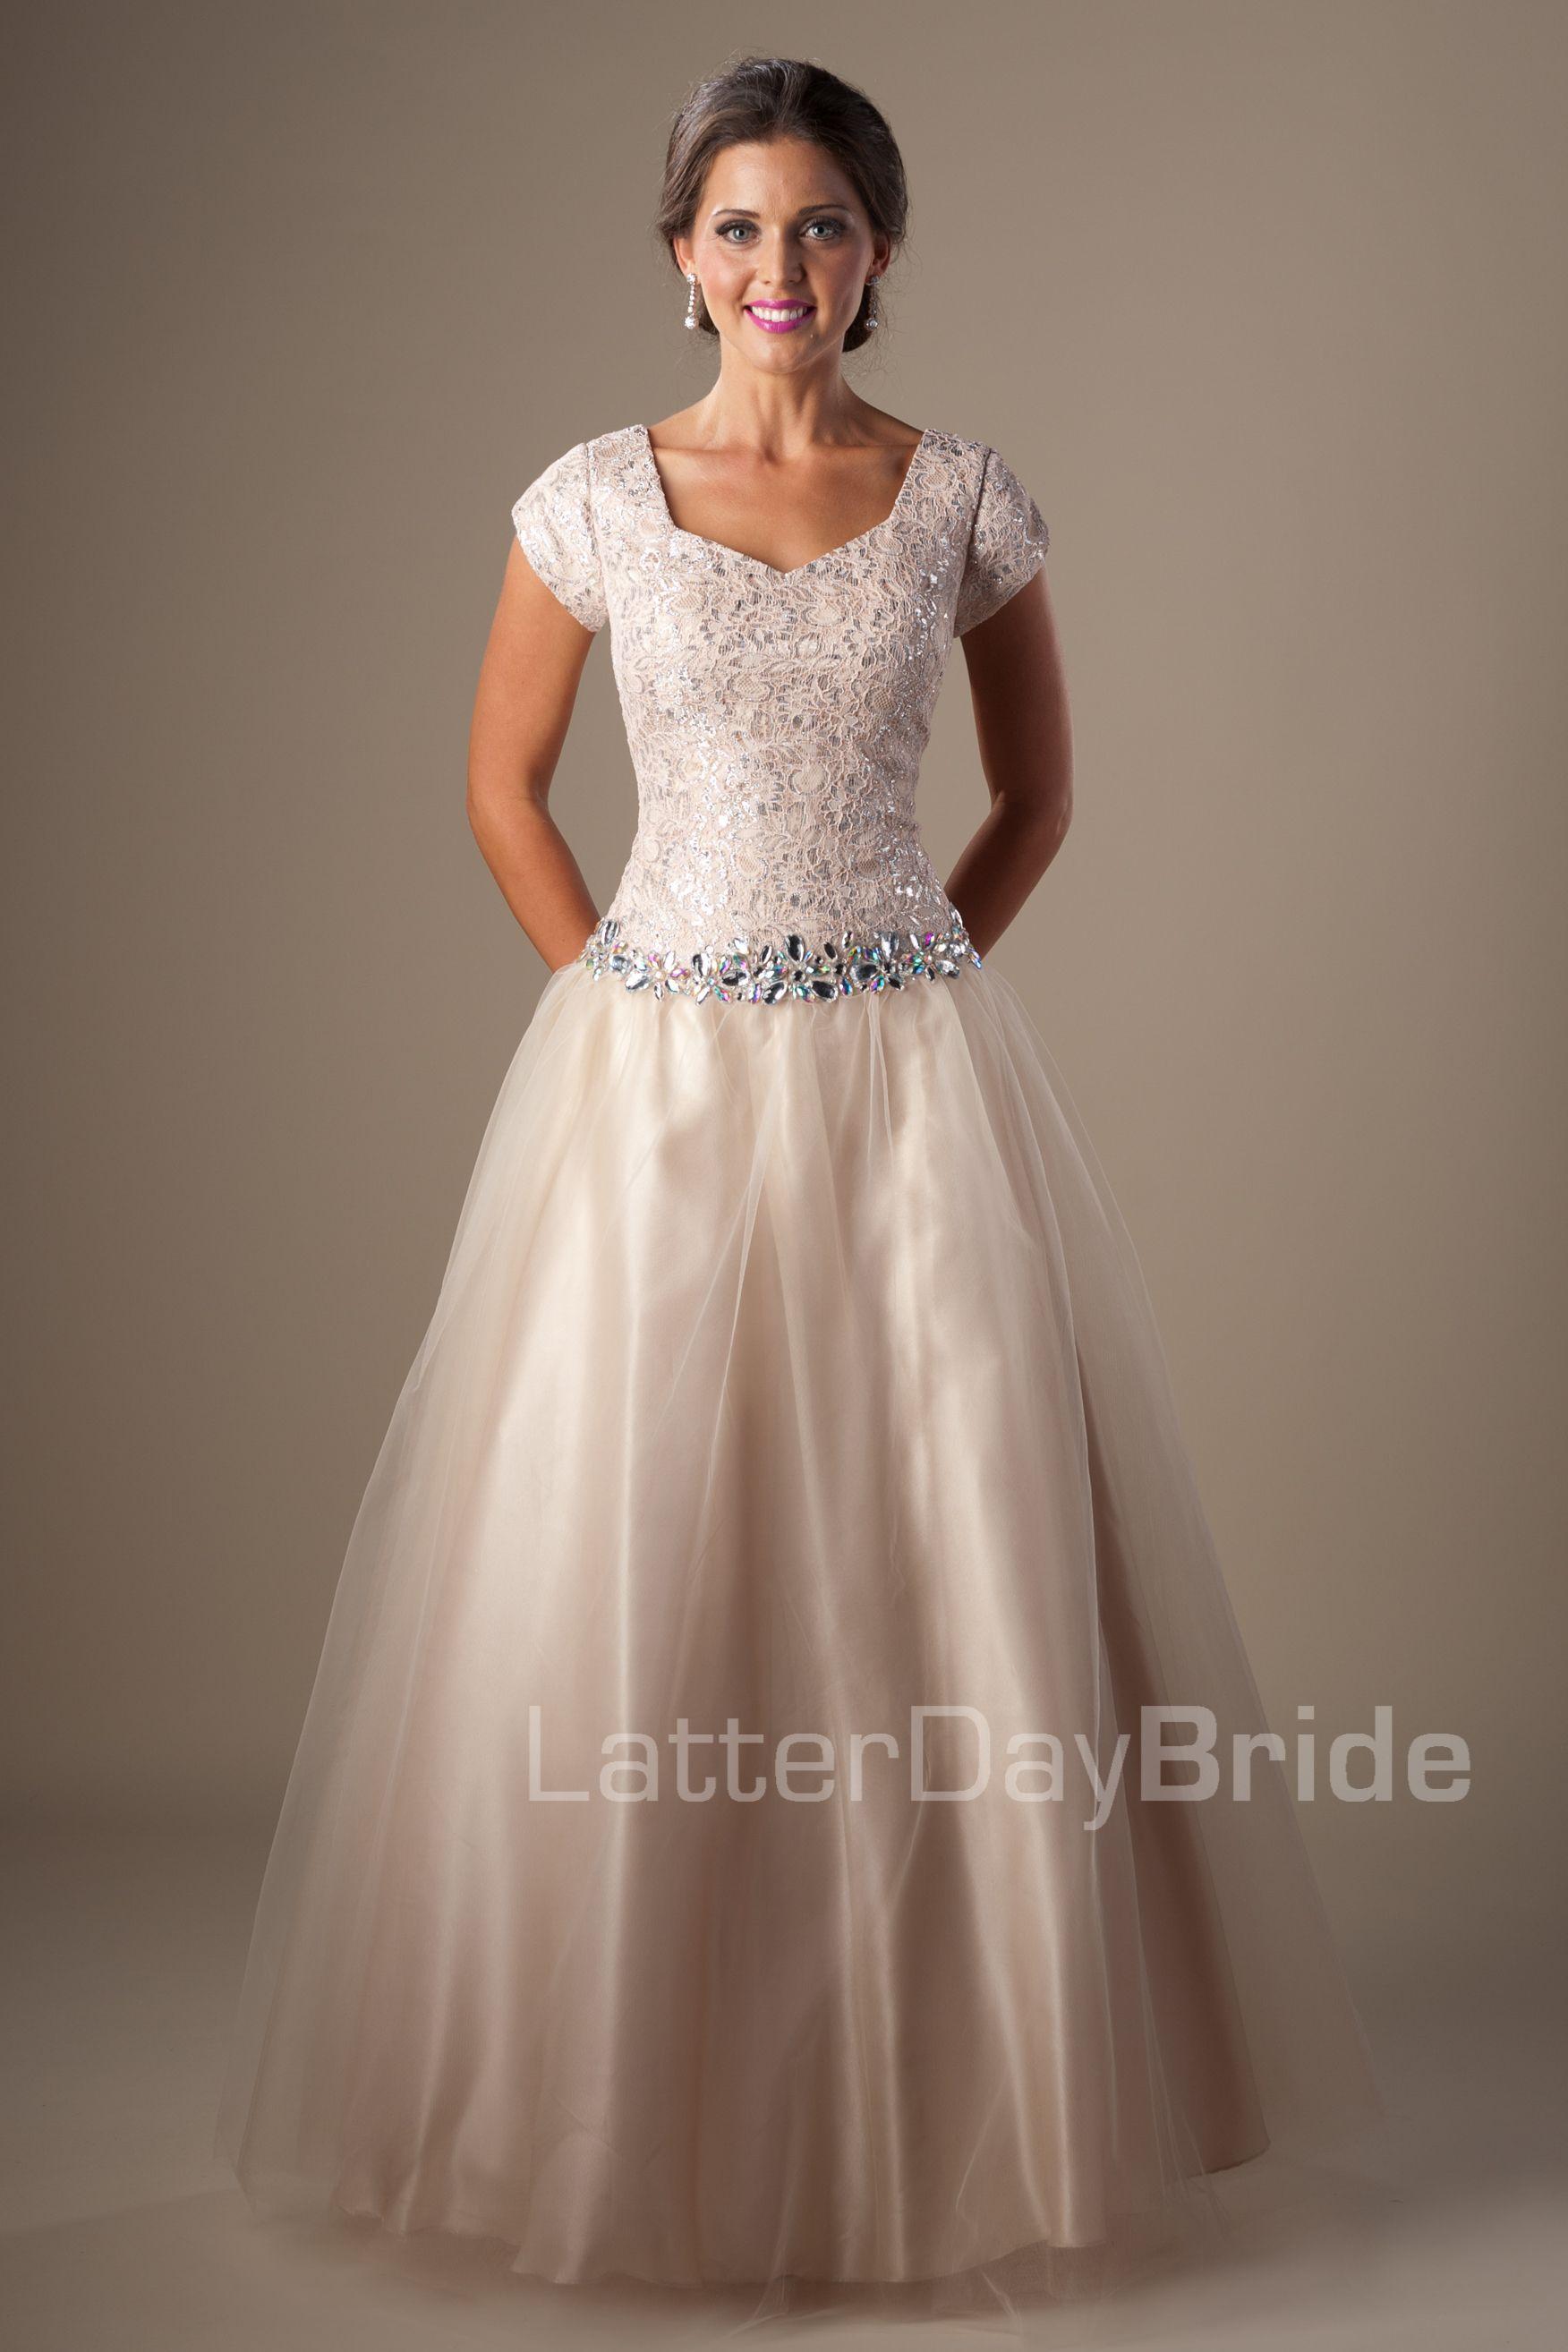 Modest prom dresses naomi anna and sarah pinterest modest